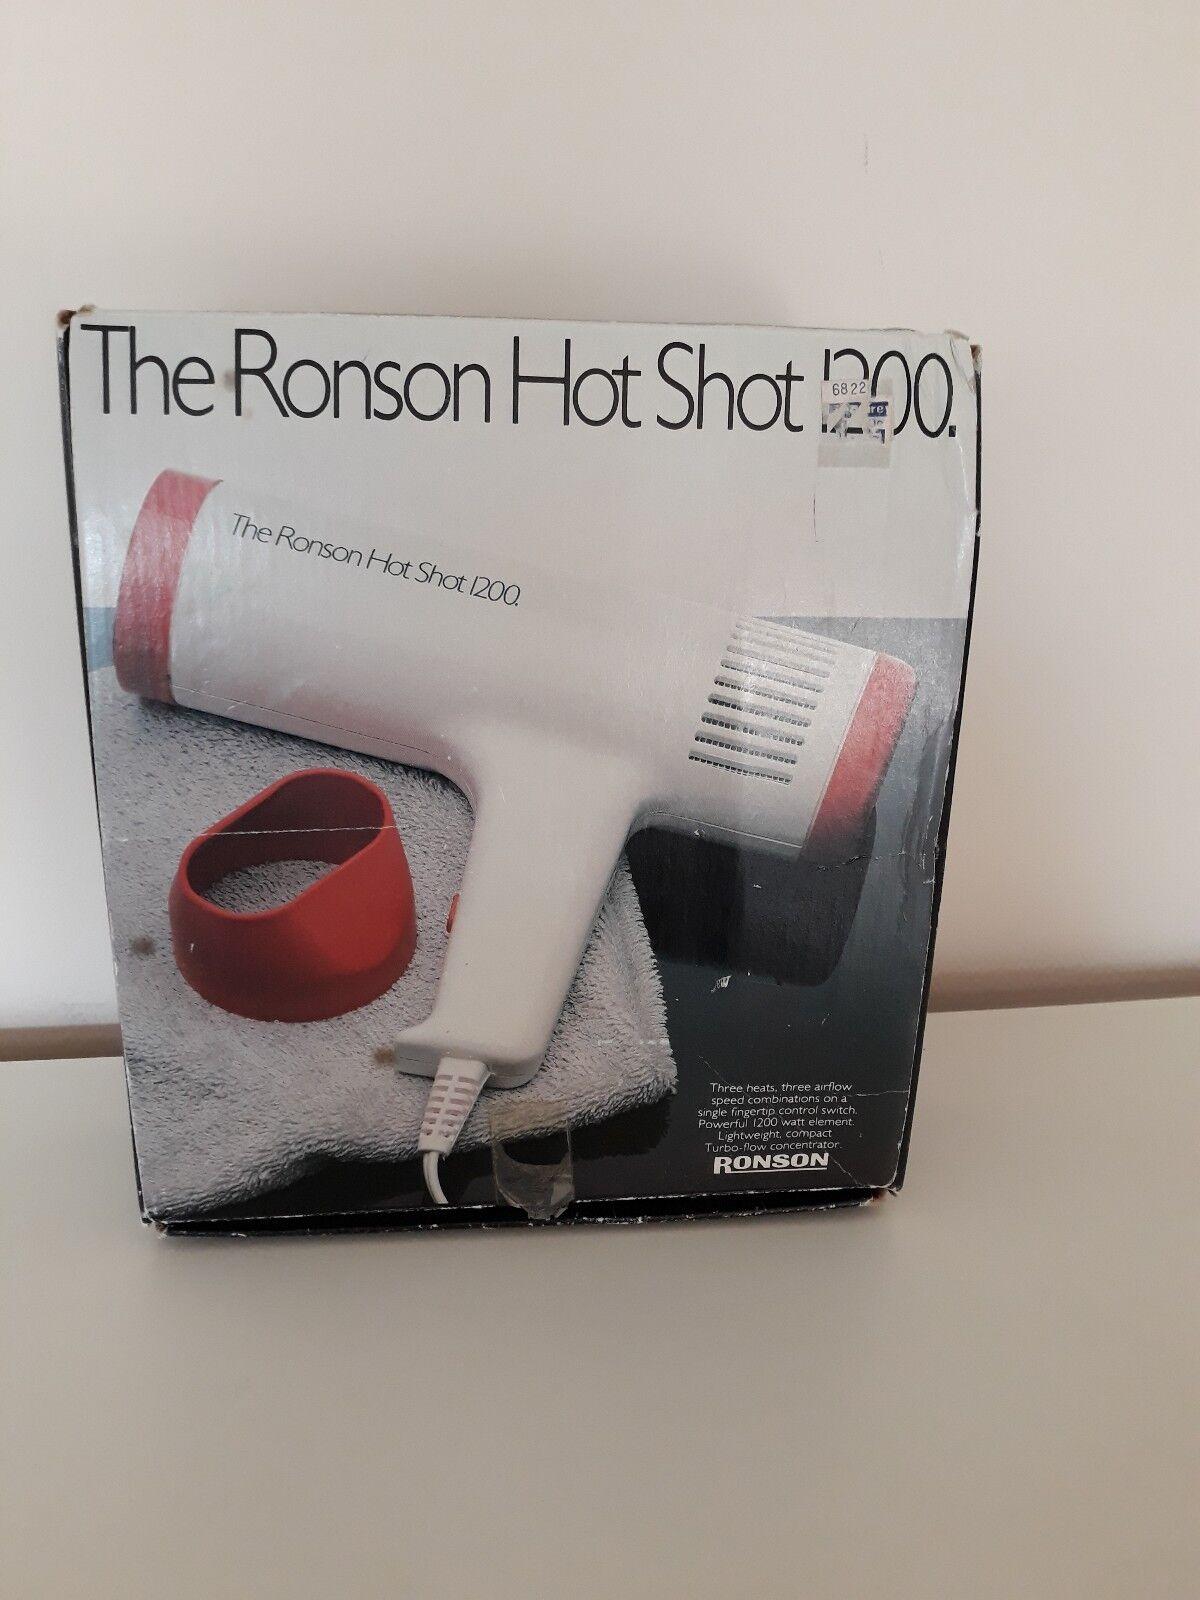 VINTAGE HAIR DRYER Ronson hot shot 1200 watt